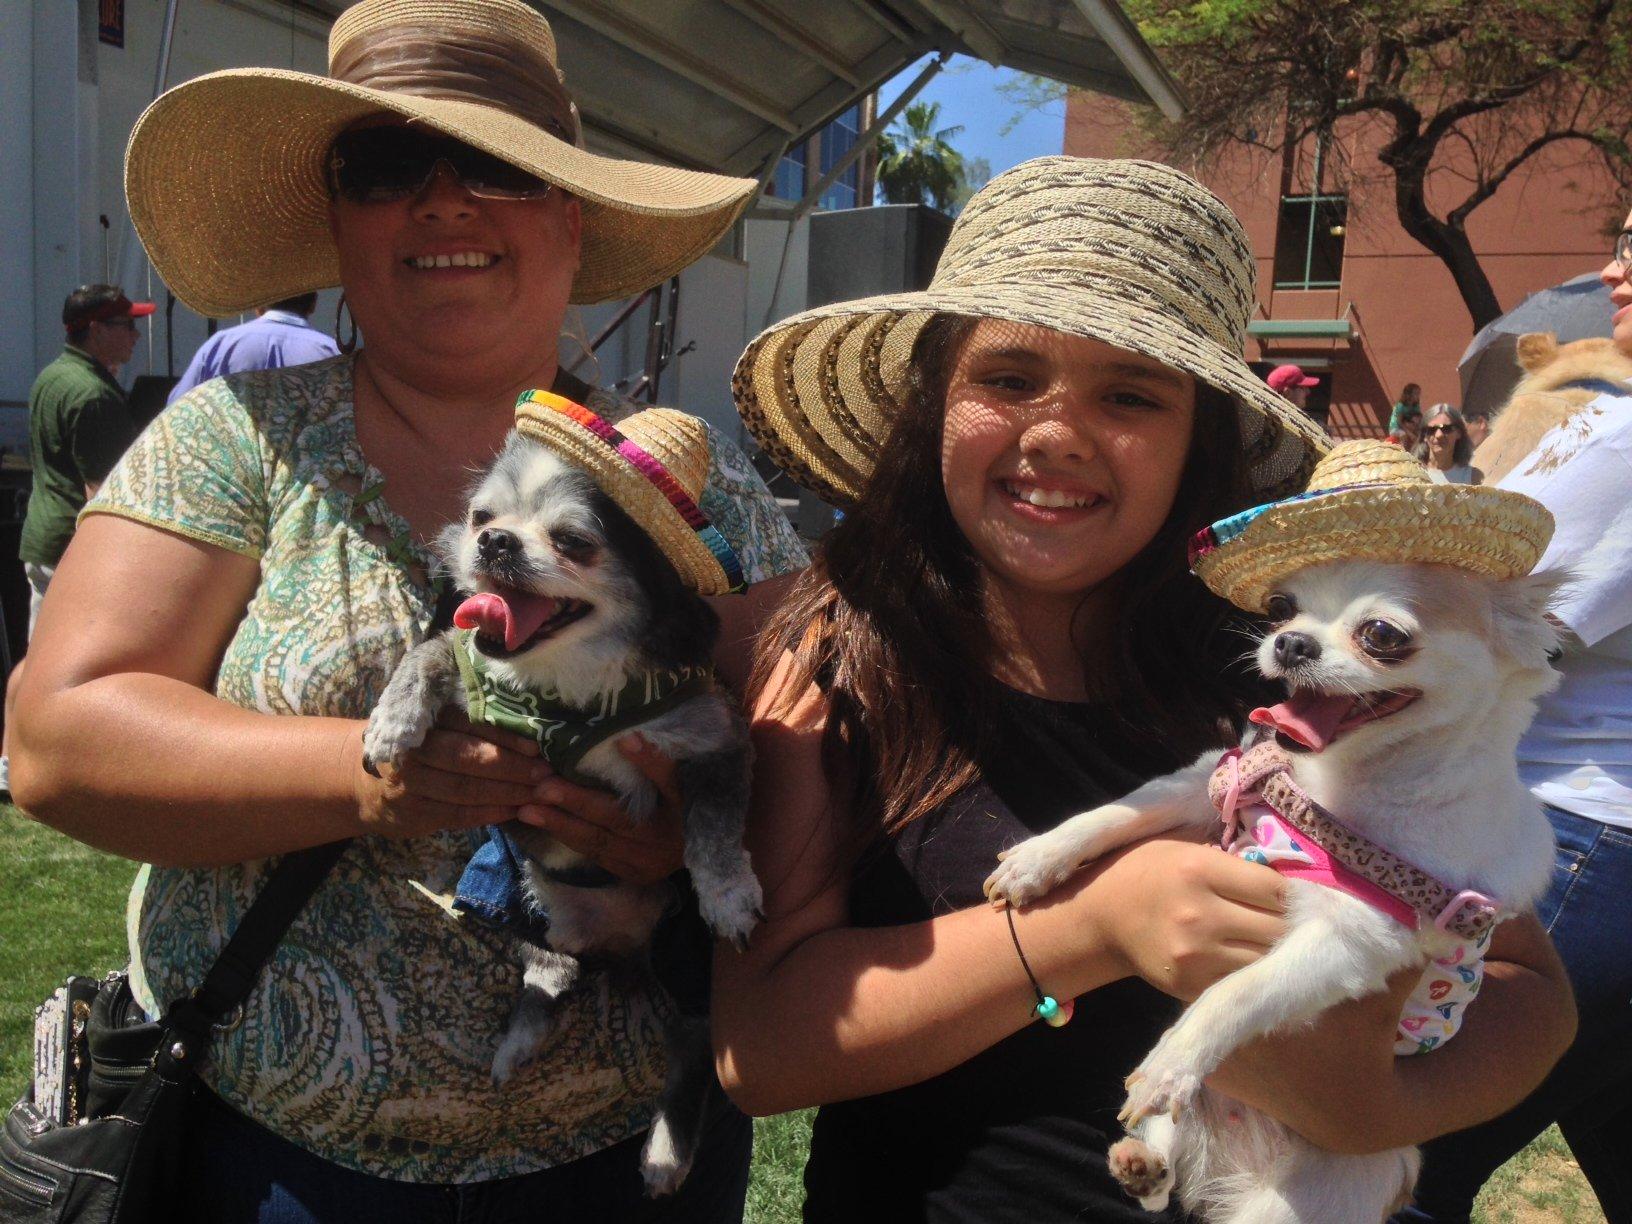 Benito (left) and Rainy join other Chihuahuas at a Chandler Cinco de Mayo celebration Saturday. (Source: Christina Batson, cbs5az.com)